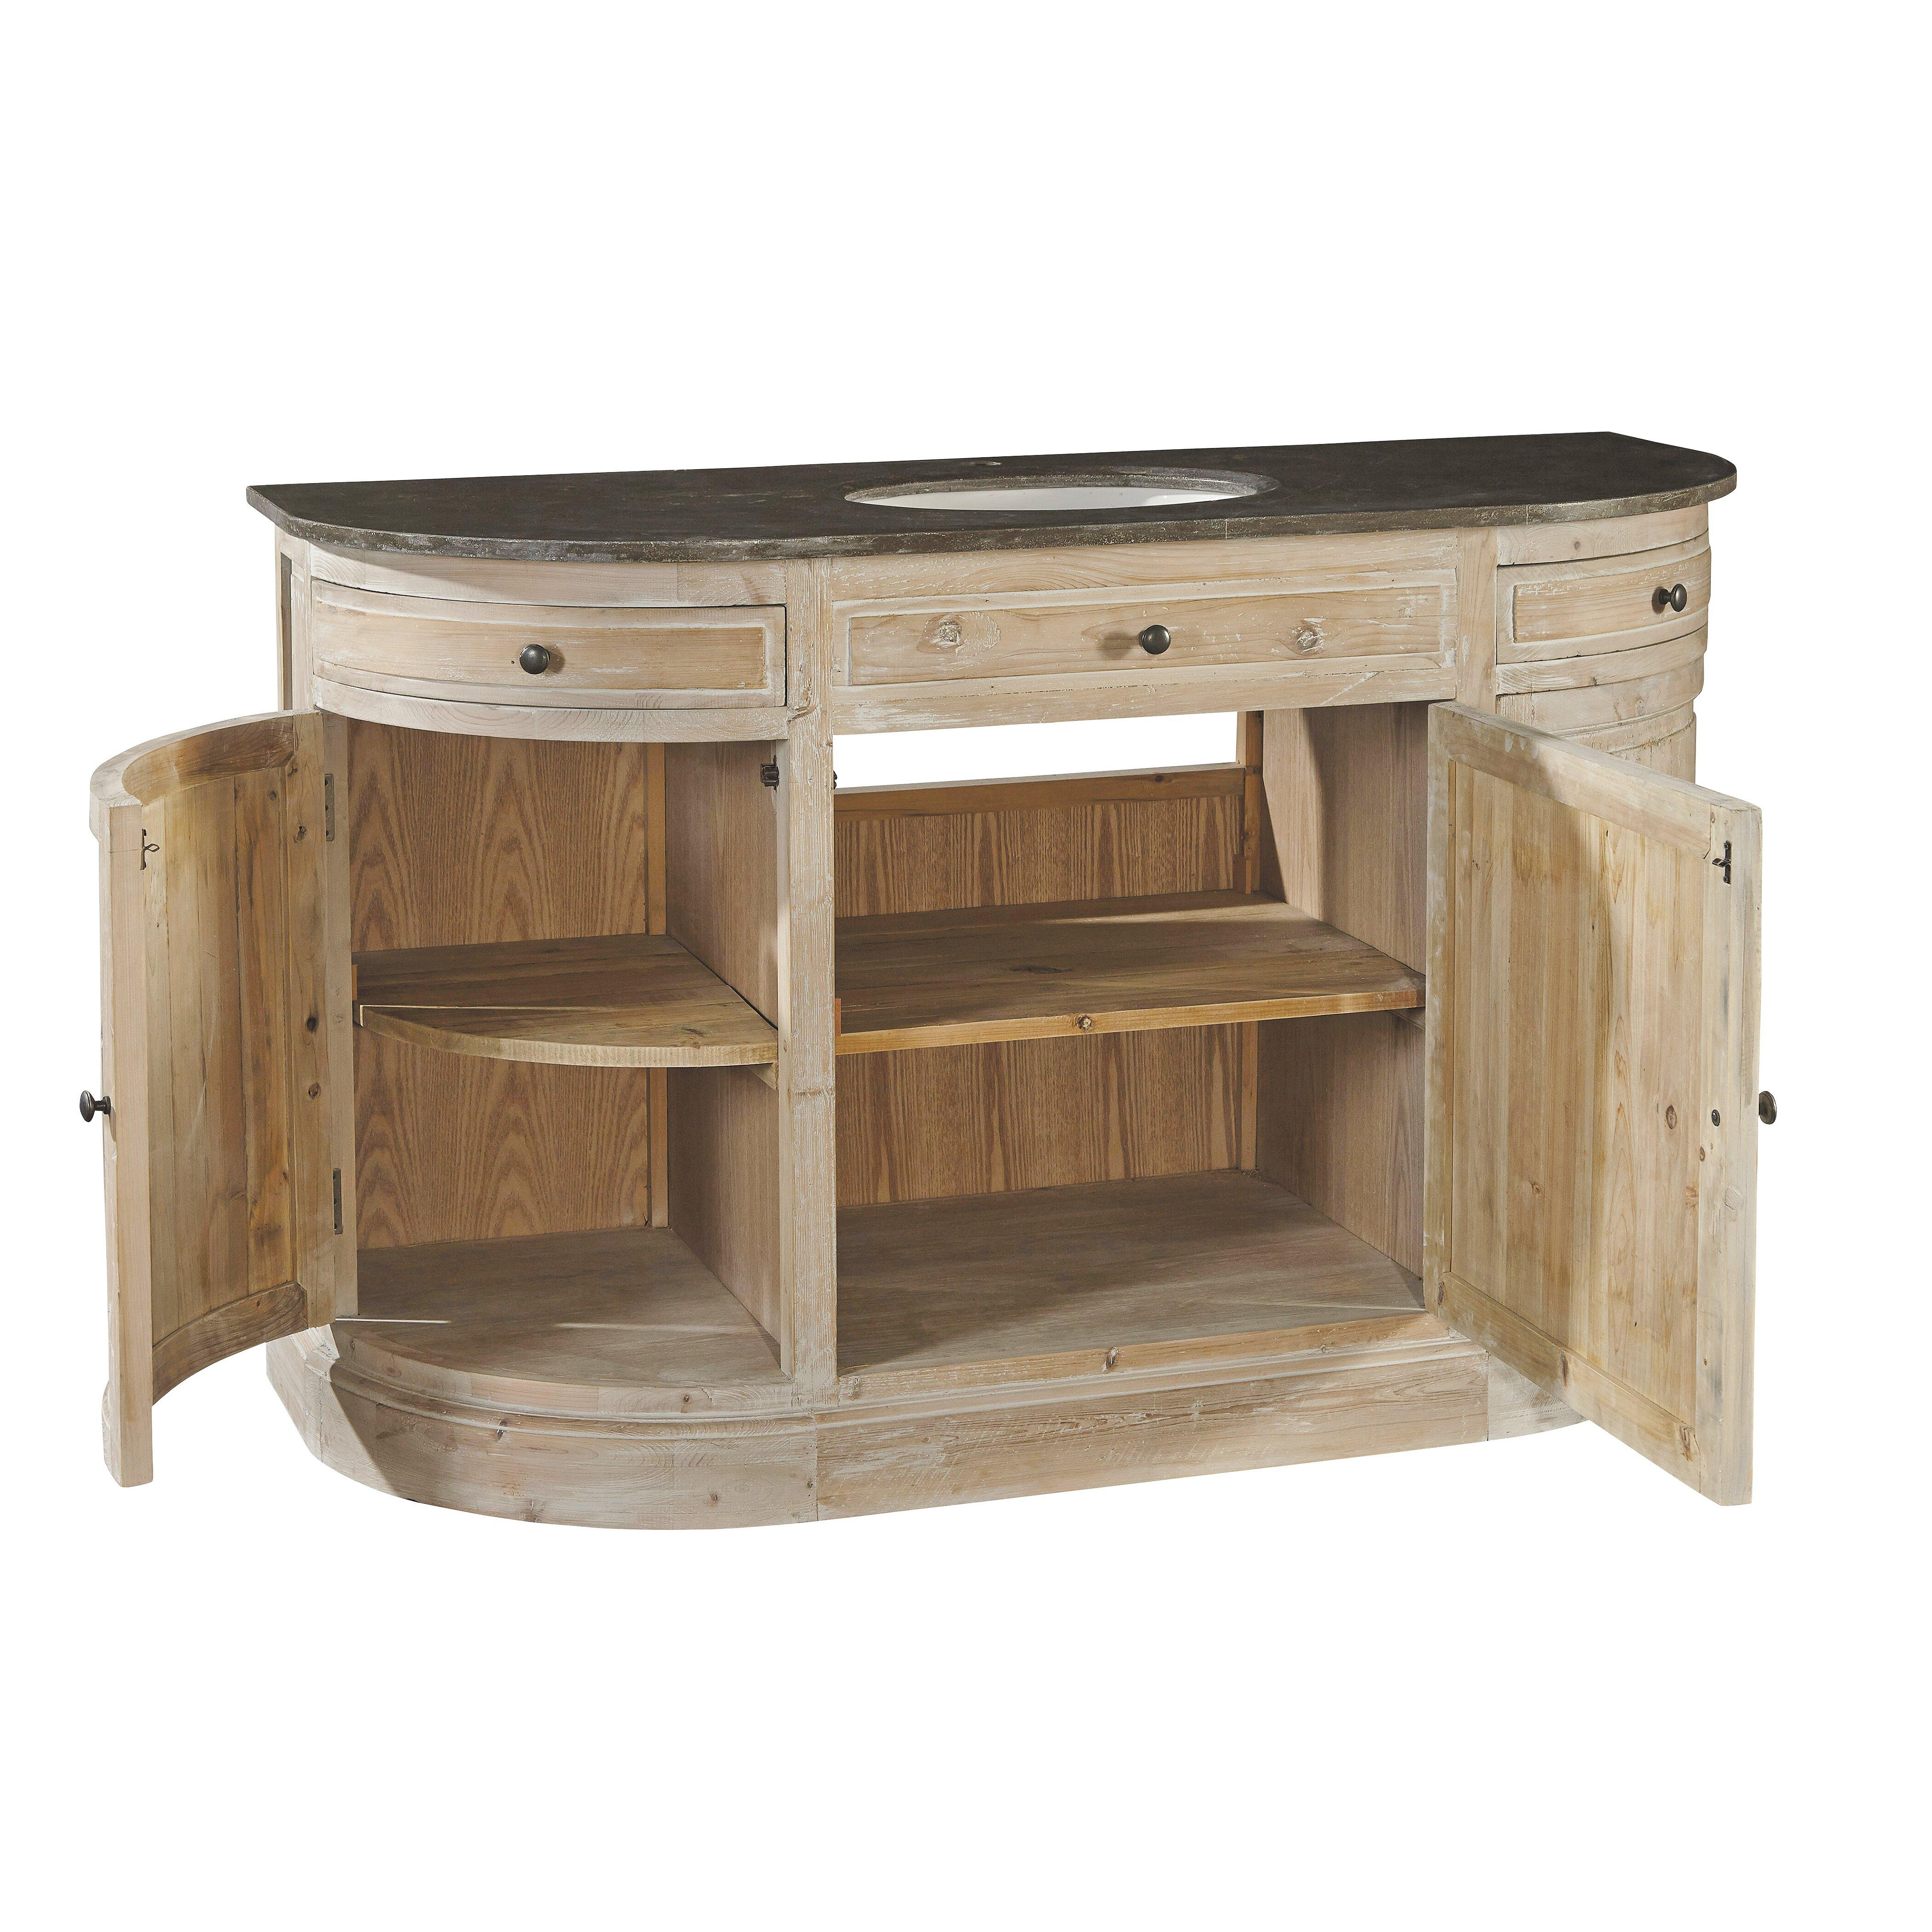 Furniture Classics Ltd 57 5 Single Demi Lune Bathroom